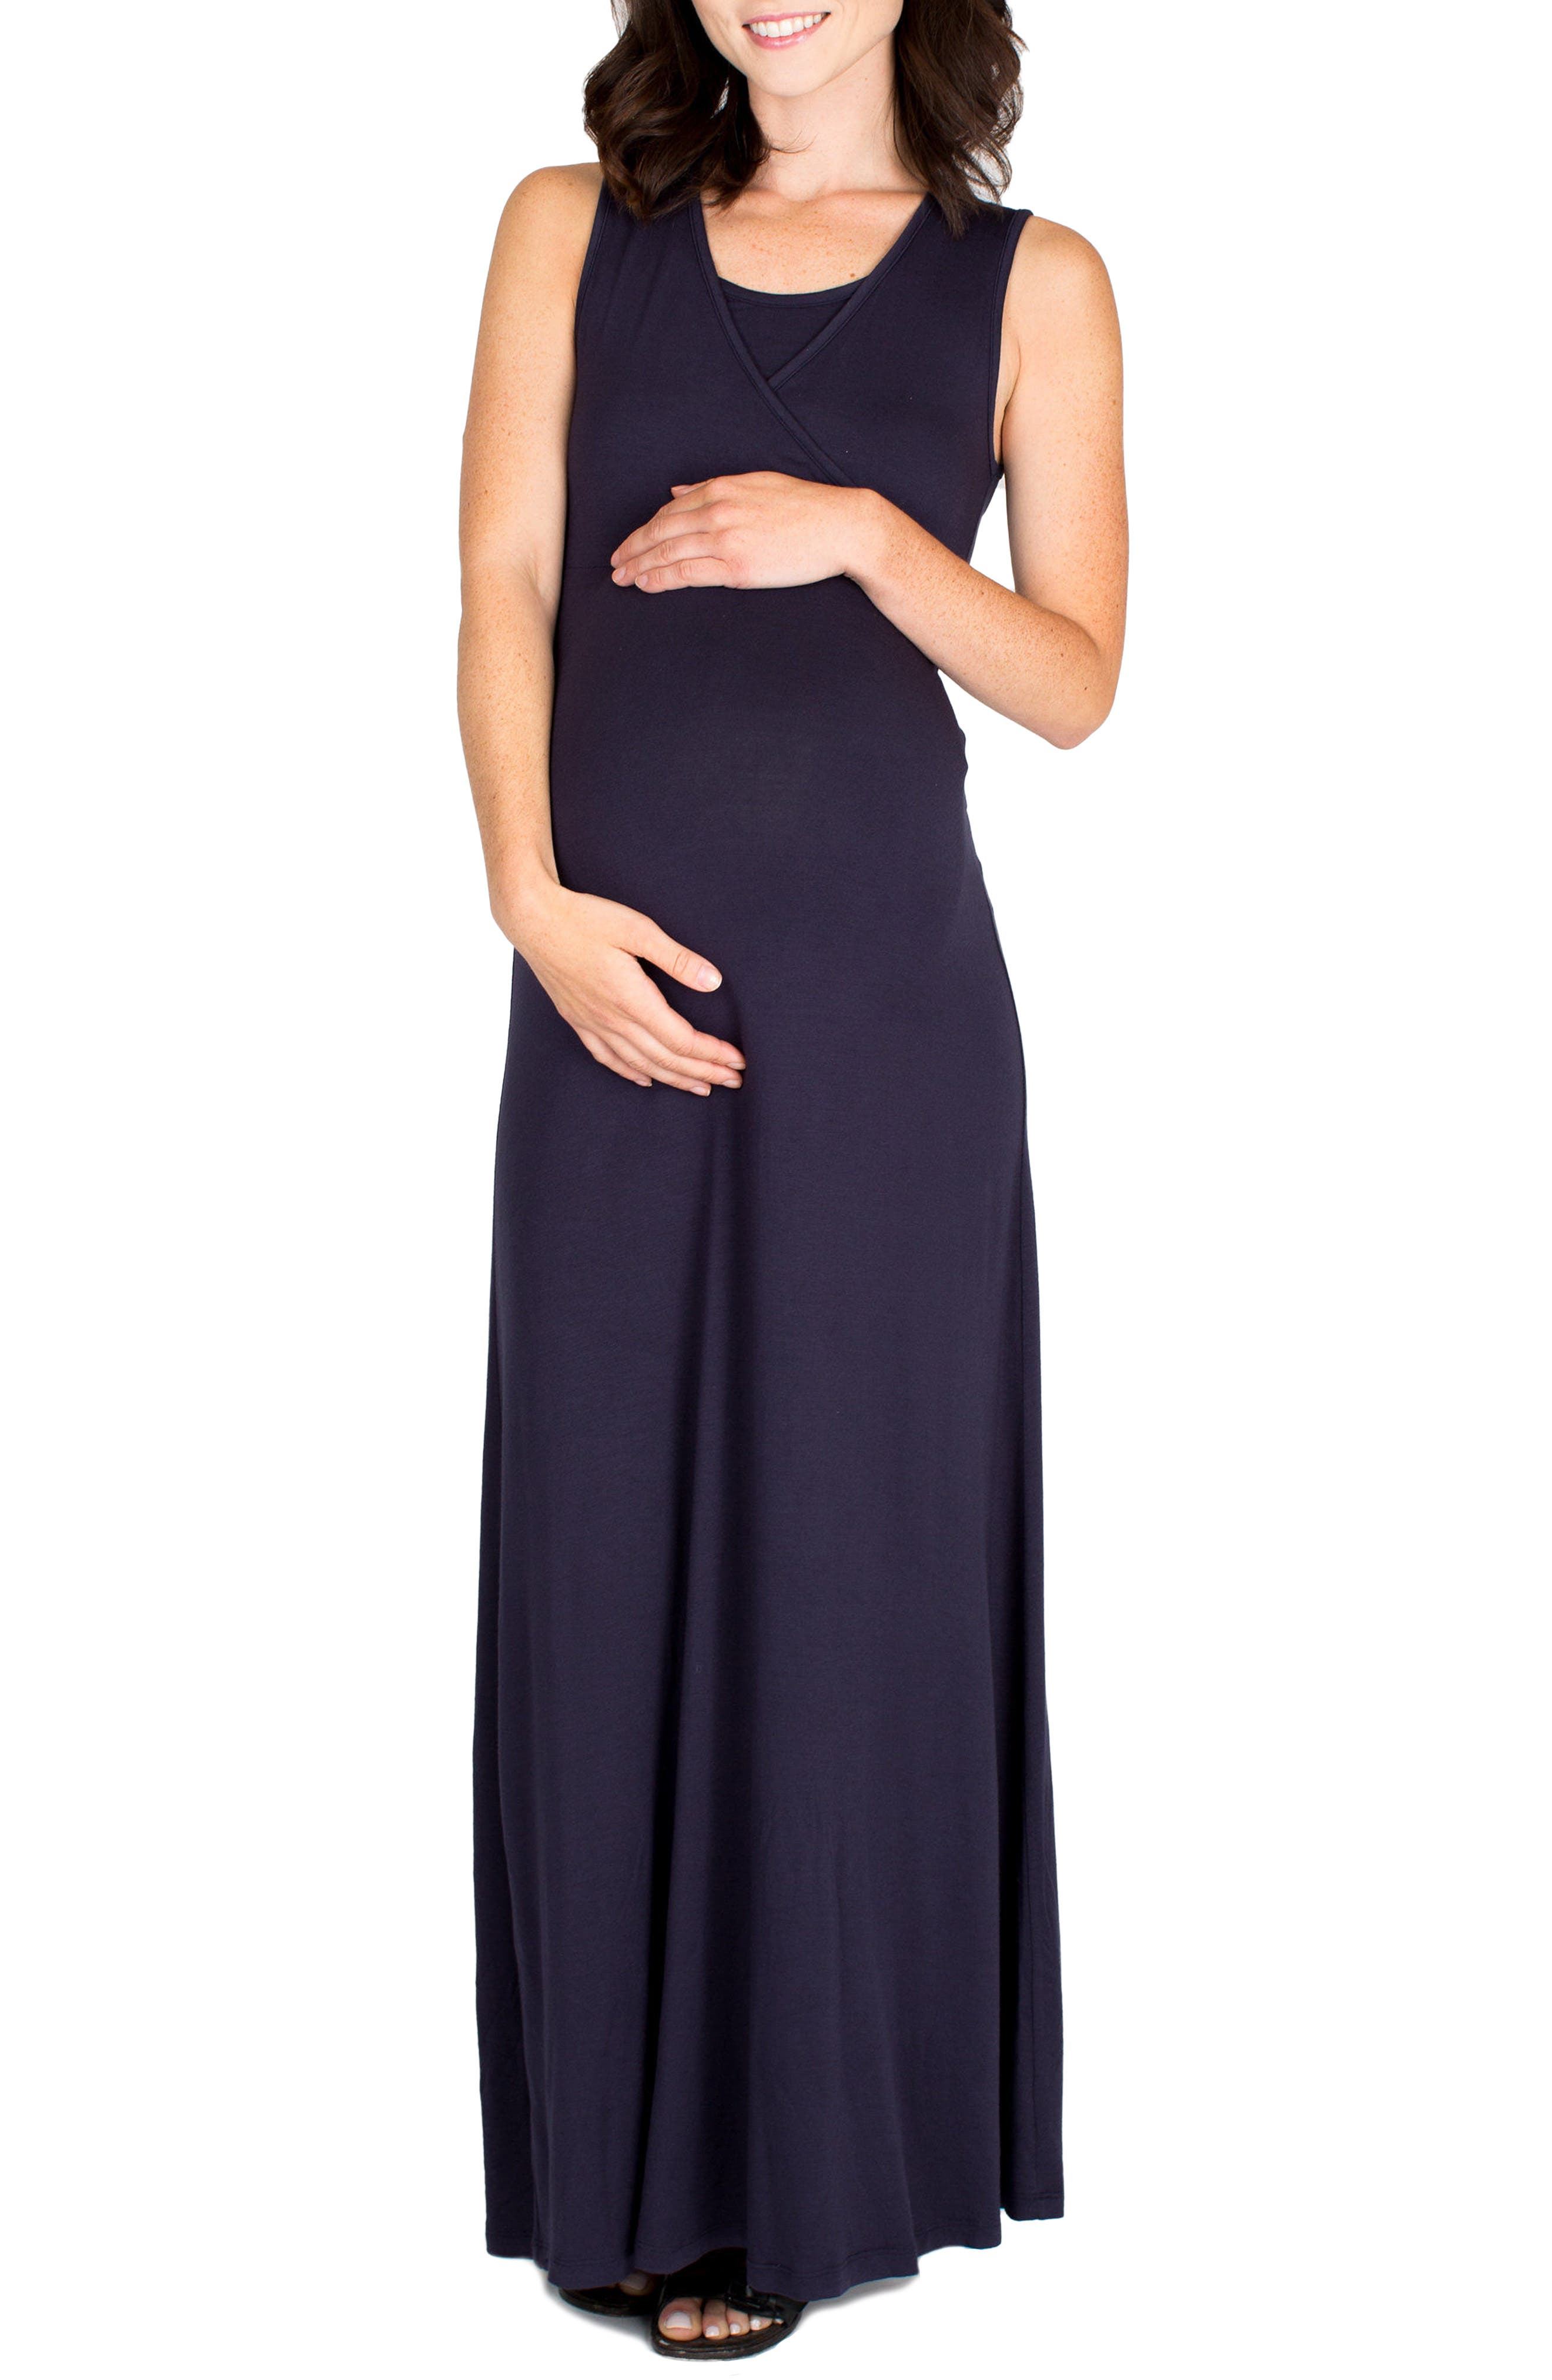 Jersey Maternity/Nursing Dress,                             Main thumbnail 1, color,                             Navy